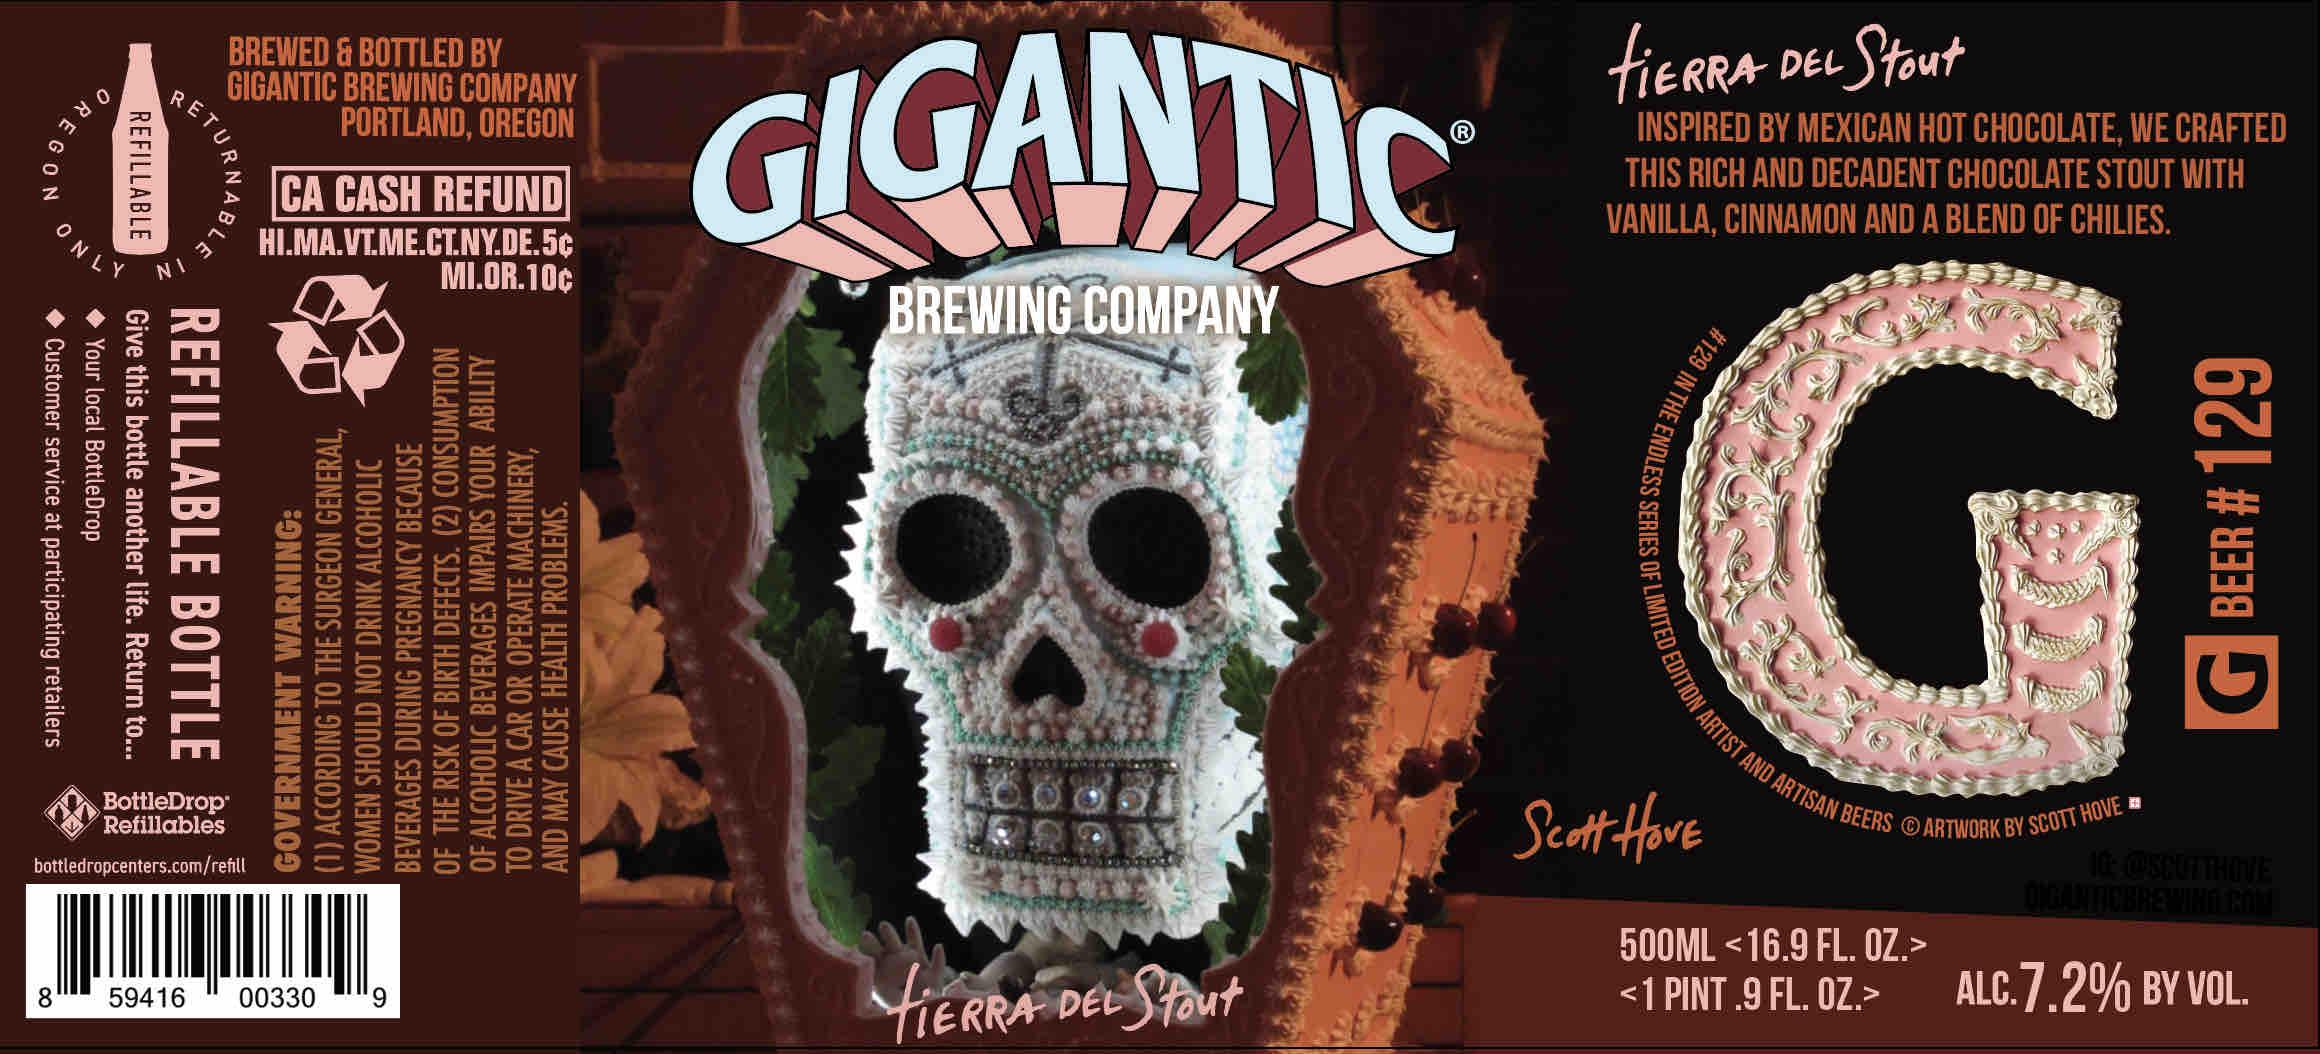 Gigantic Brewing Tierra Del Stout Label by Scott Hove